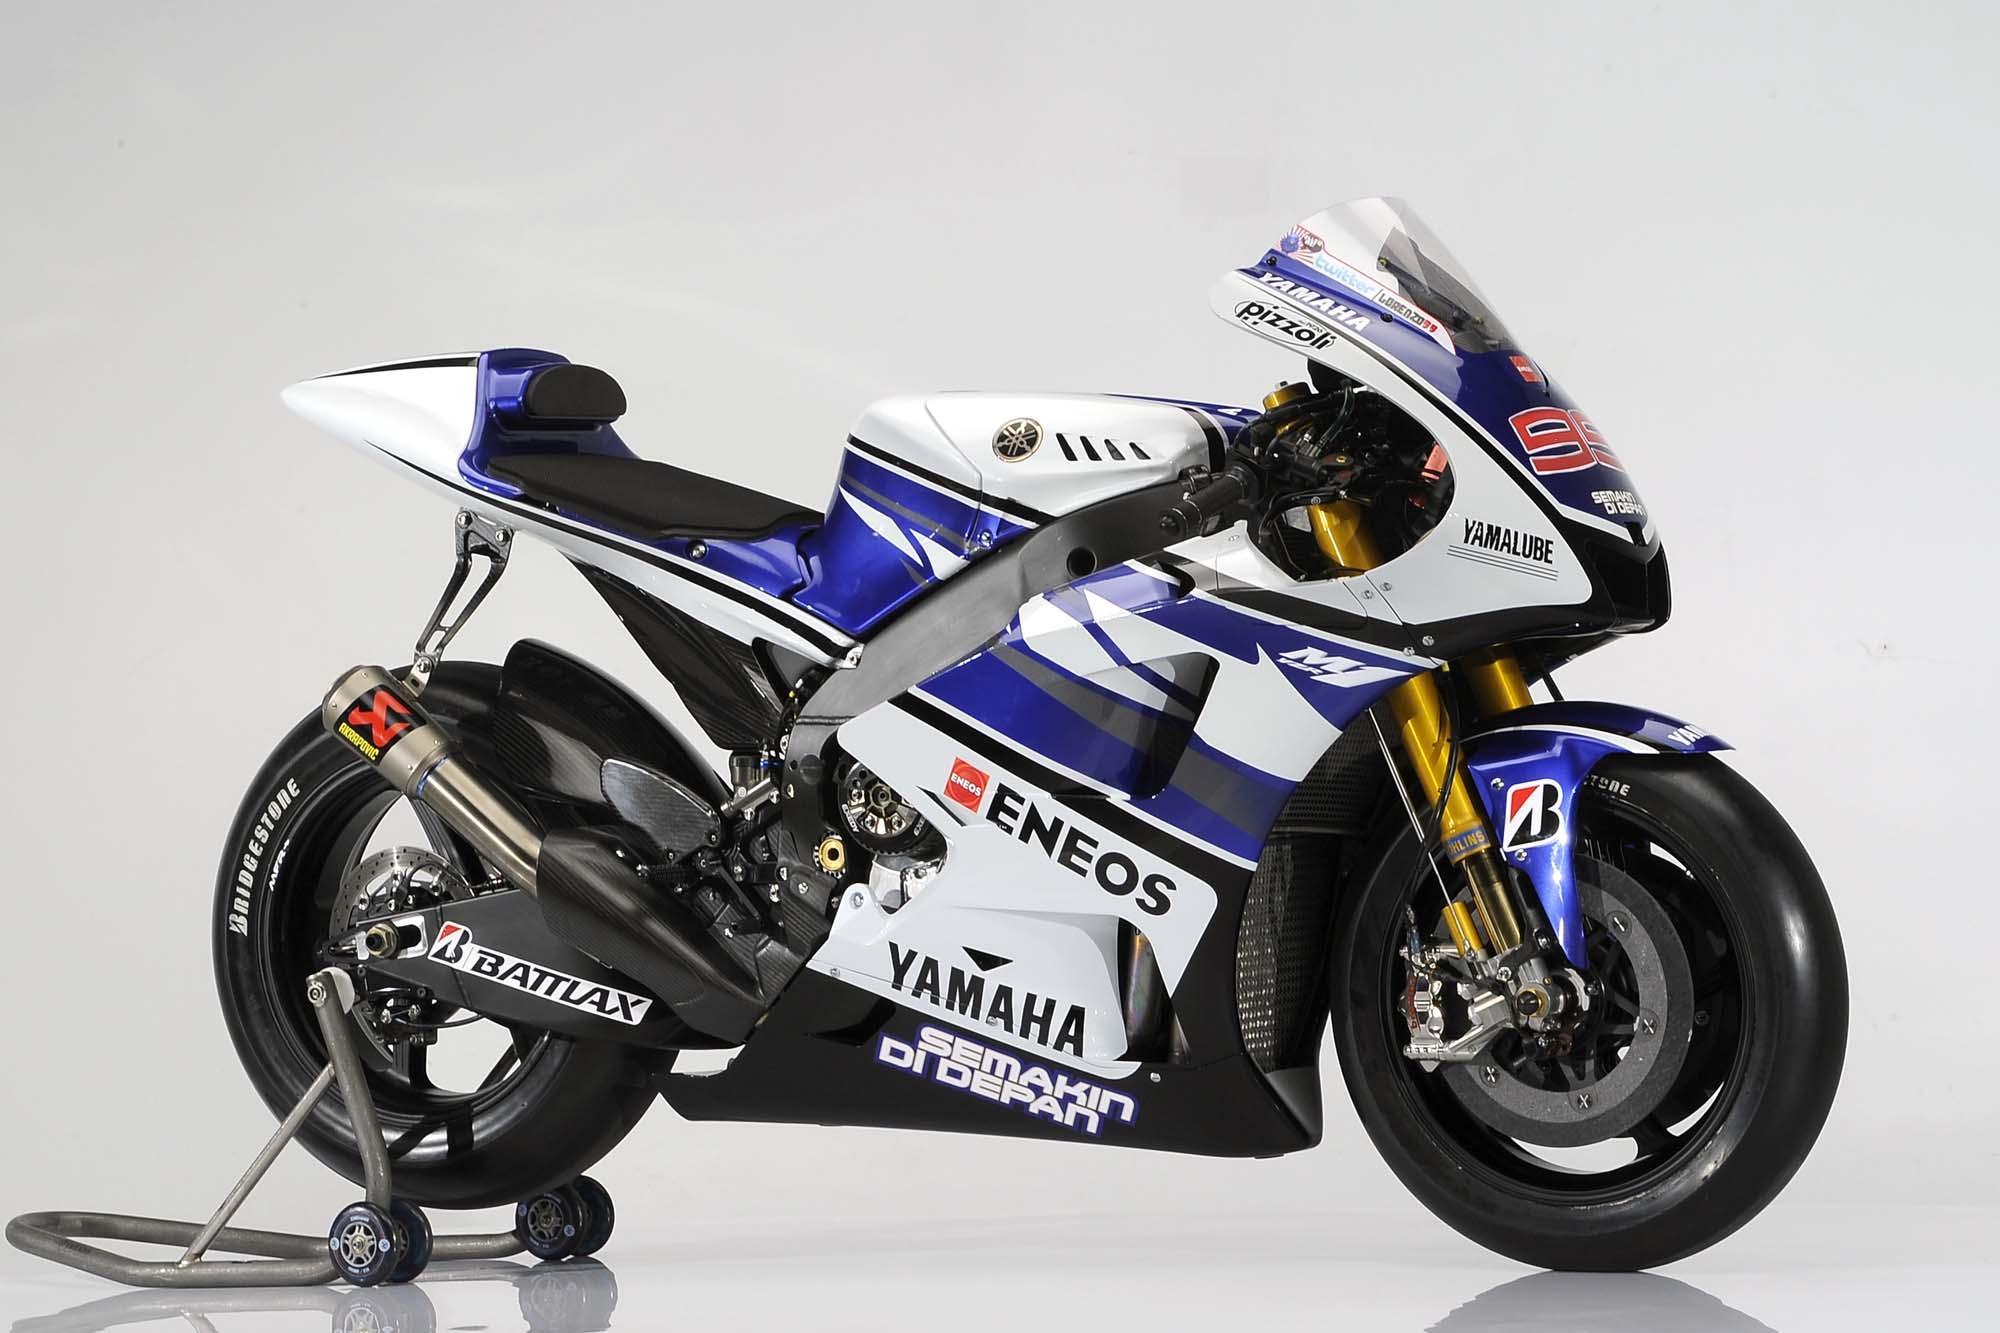 2012 Yamaha YZR-M1 Breaks Cover at Jerez - Asphalt & Rubber